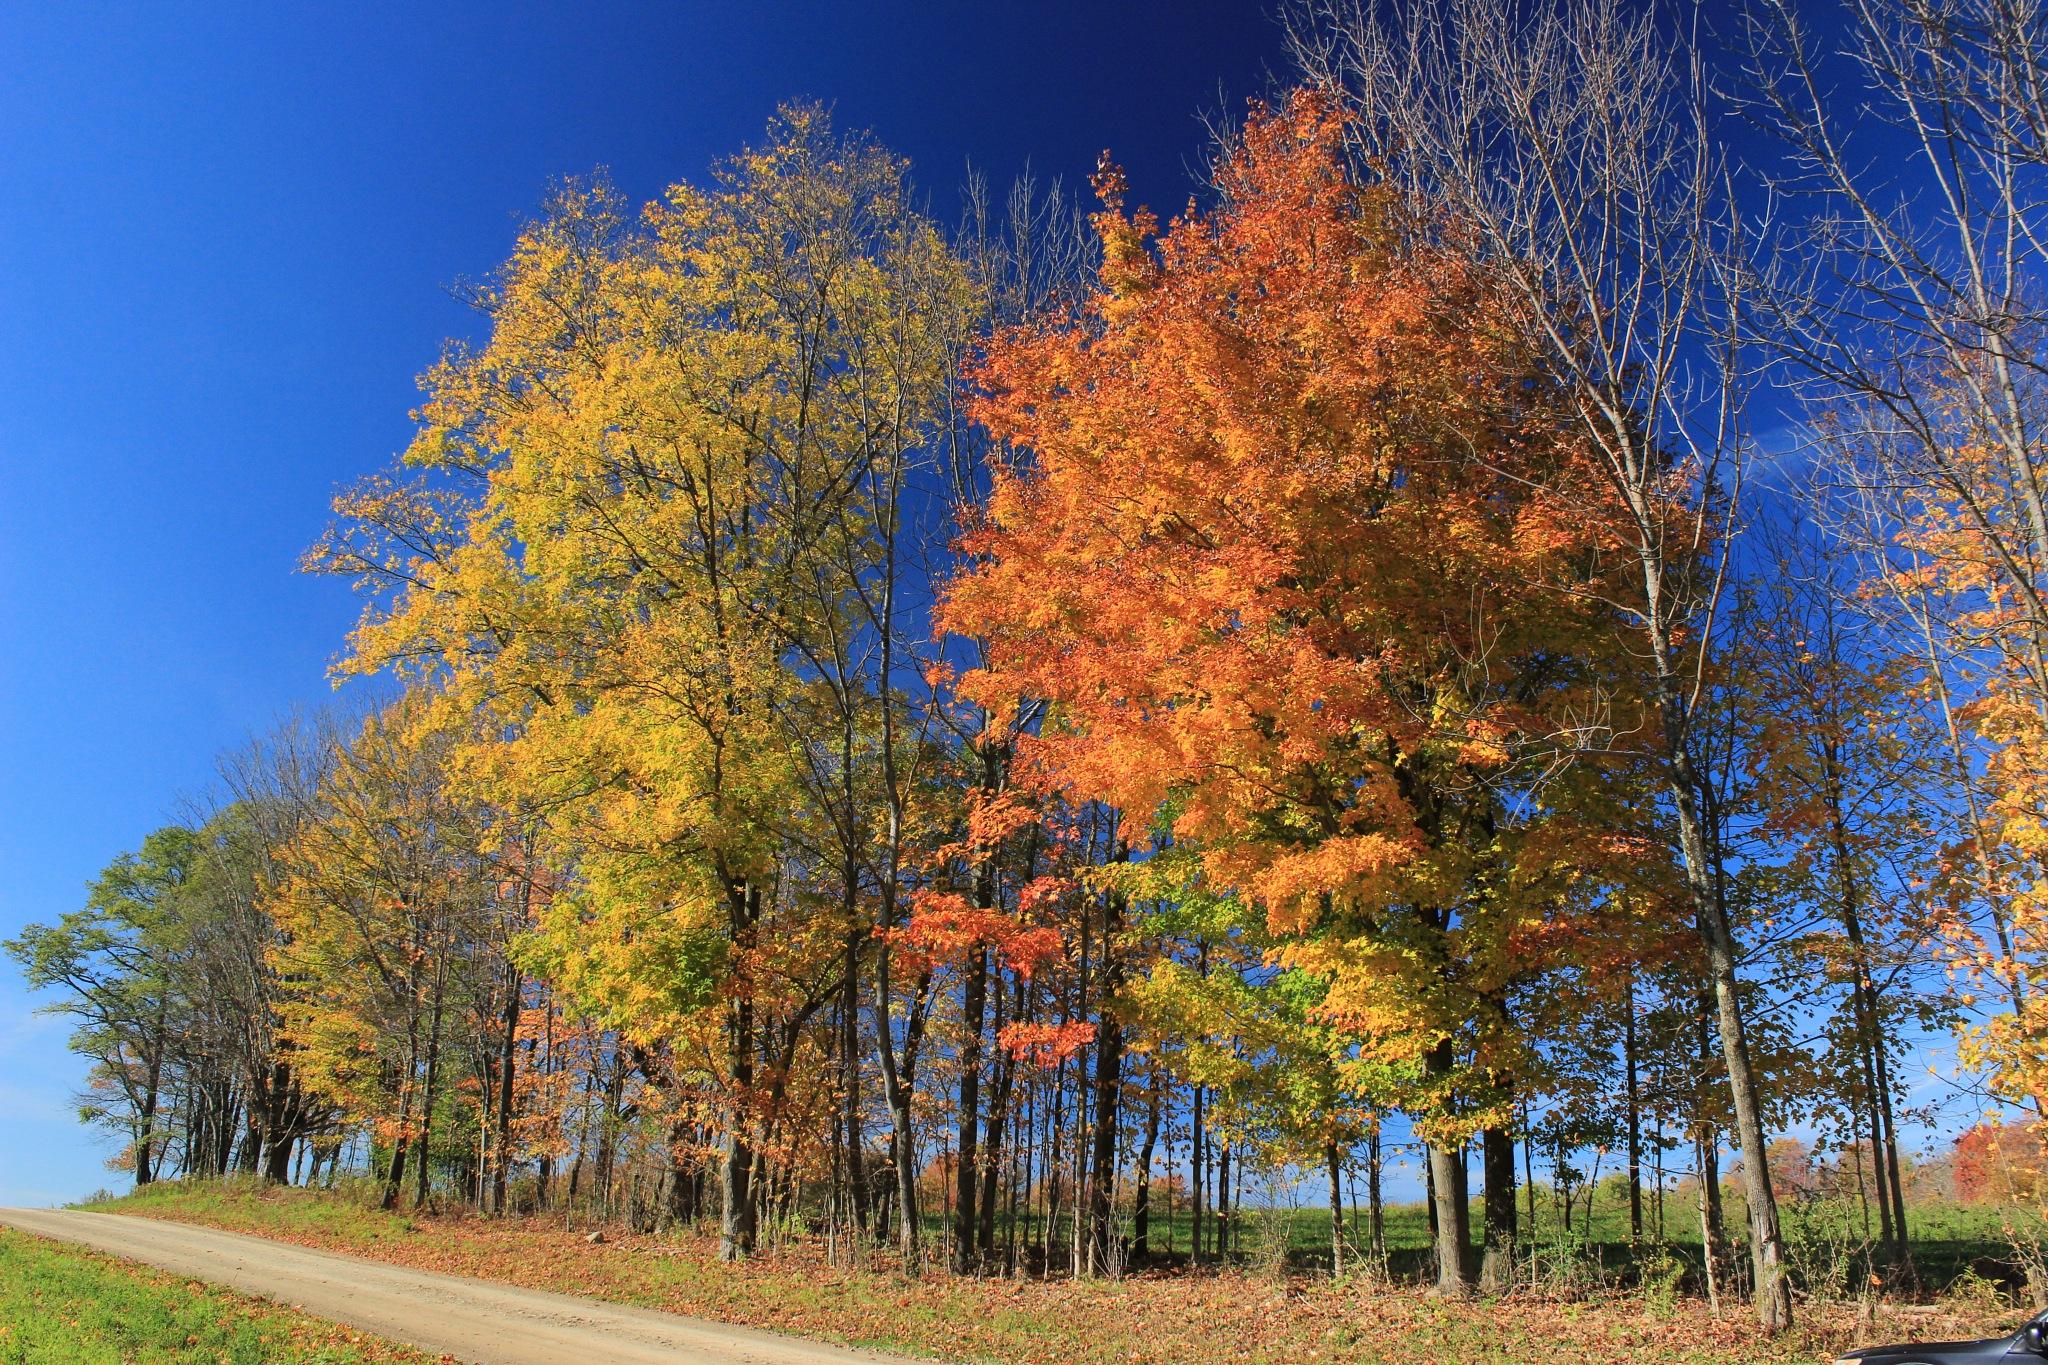 Fall in Sugar Grove by Auggie23